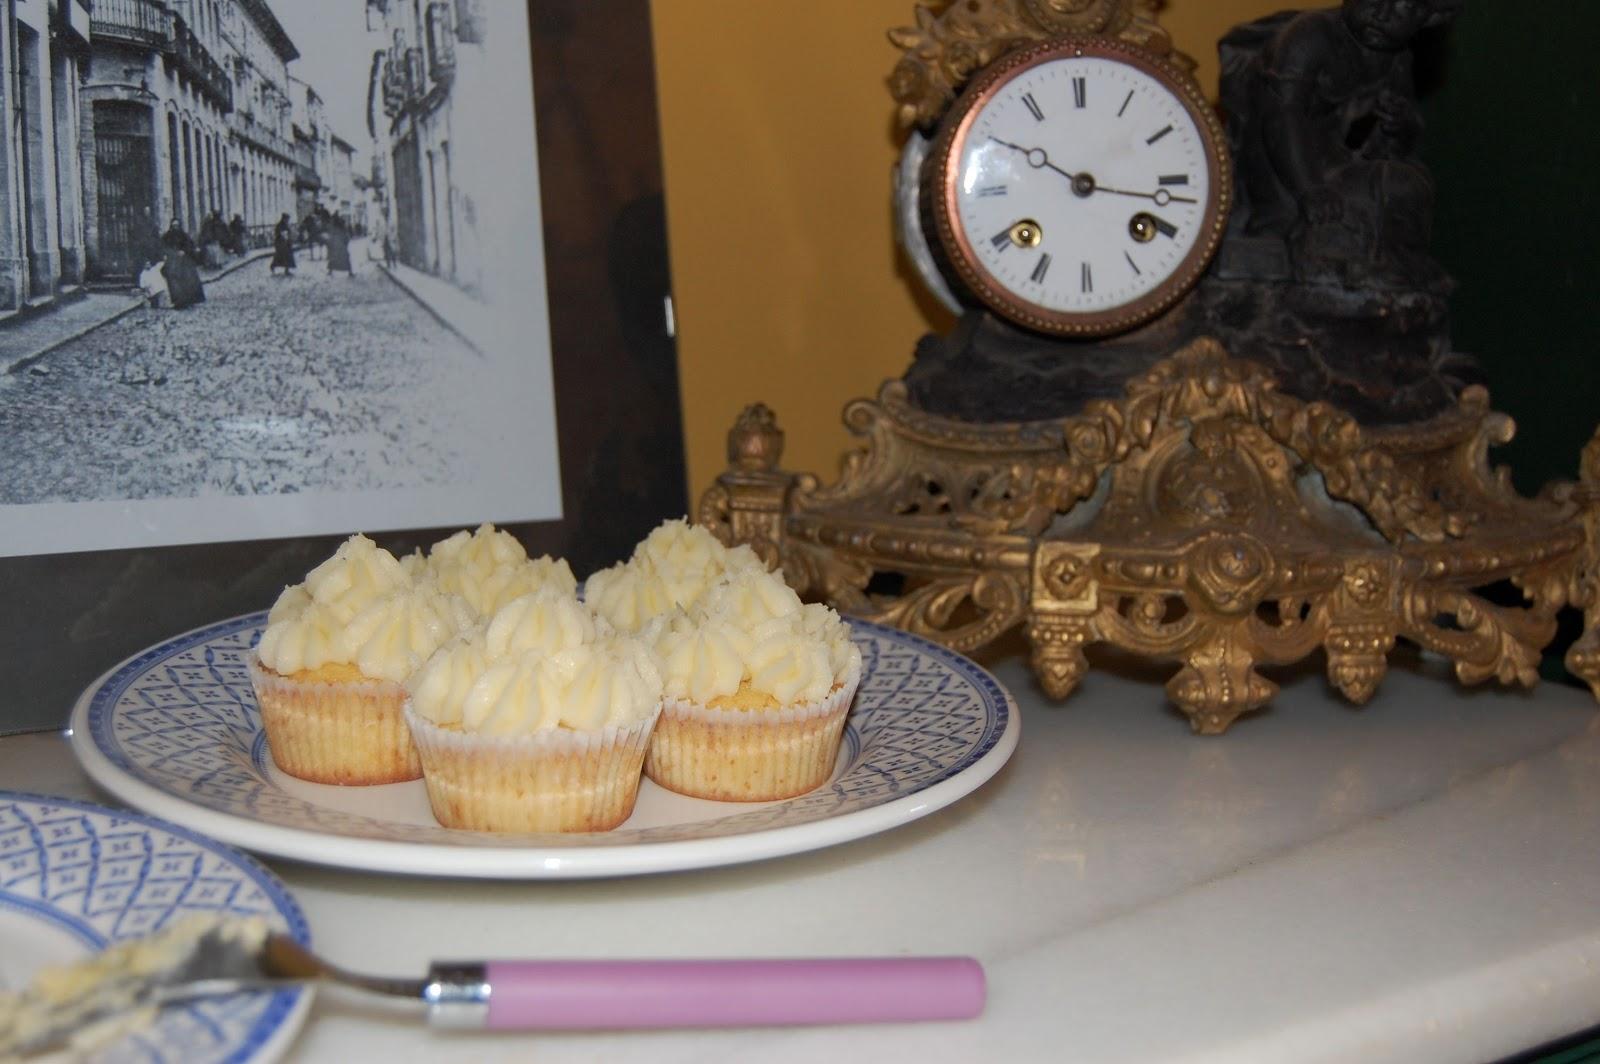 http://azucarenmicocina.blogspot.com.es/2012/11/cupcakes-lemon-curd.html